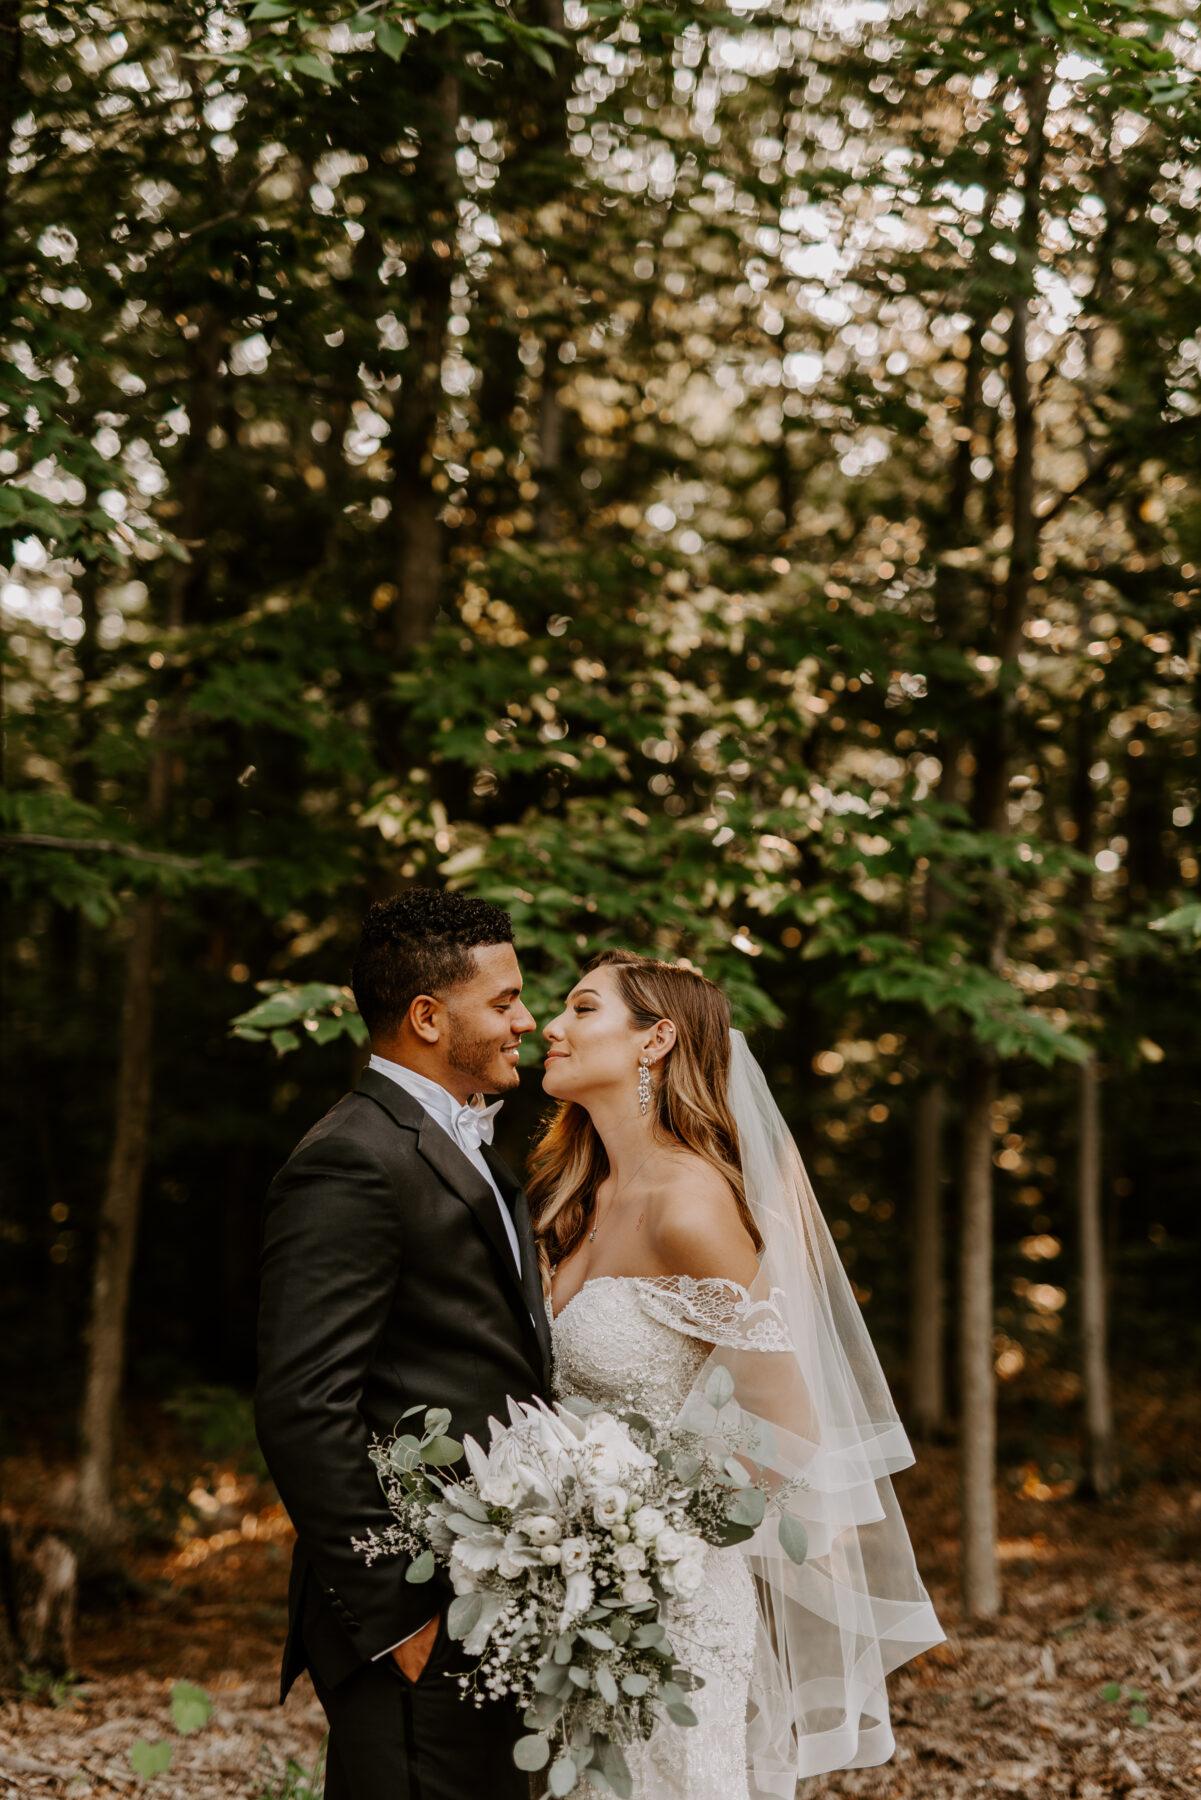 Five Bridge Inn Rehoboth Wedding Katie and Enrique Blueflash Photography 13